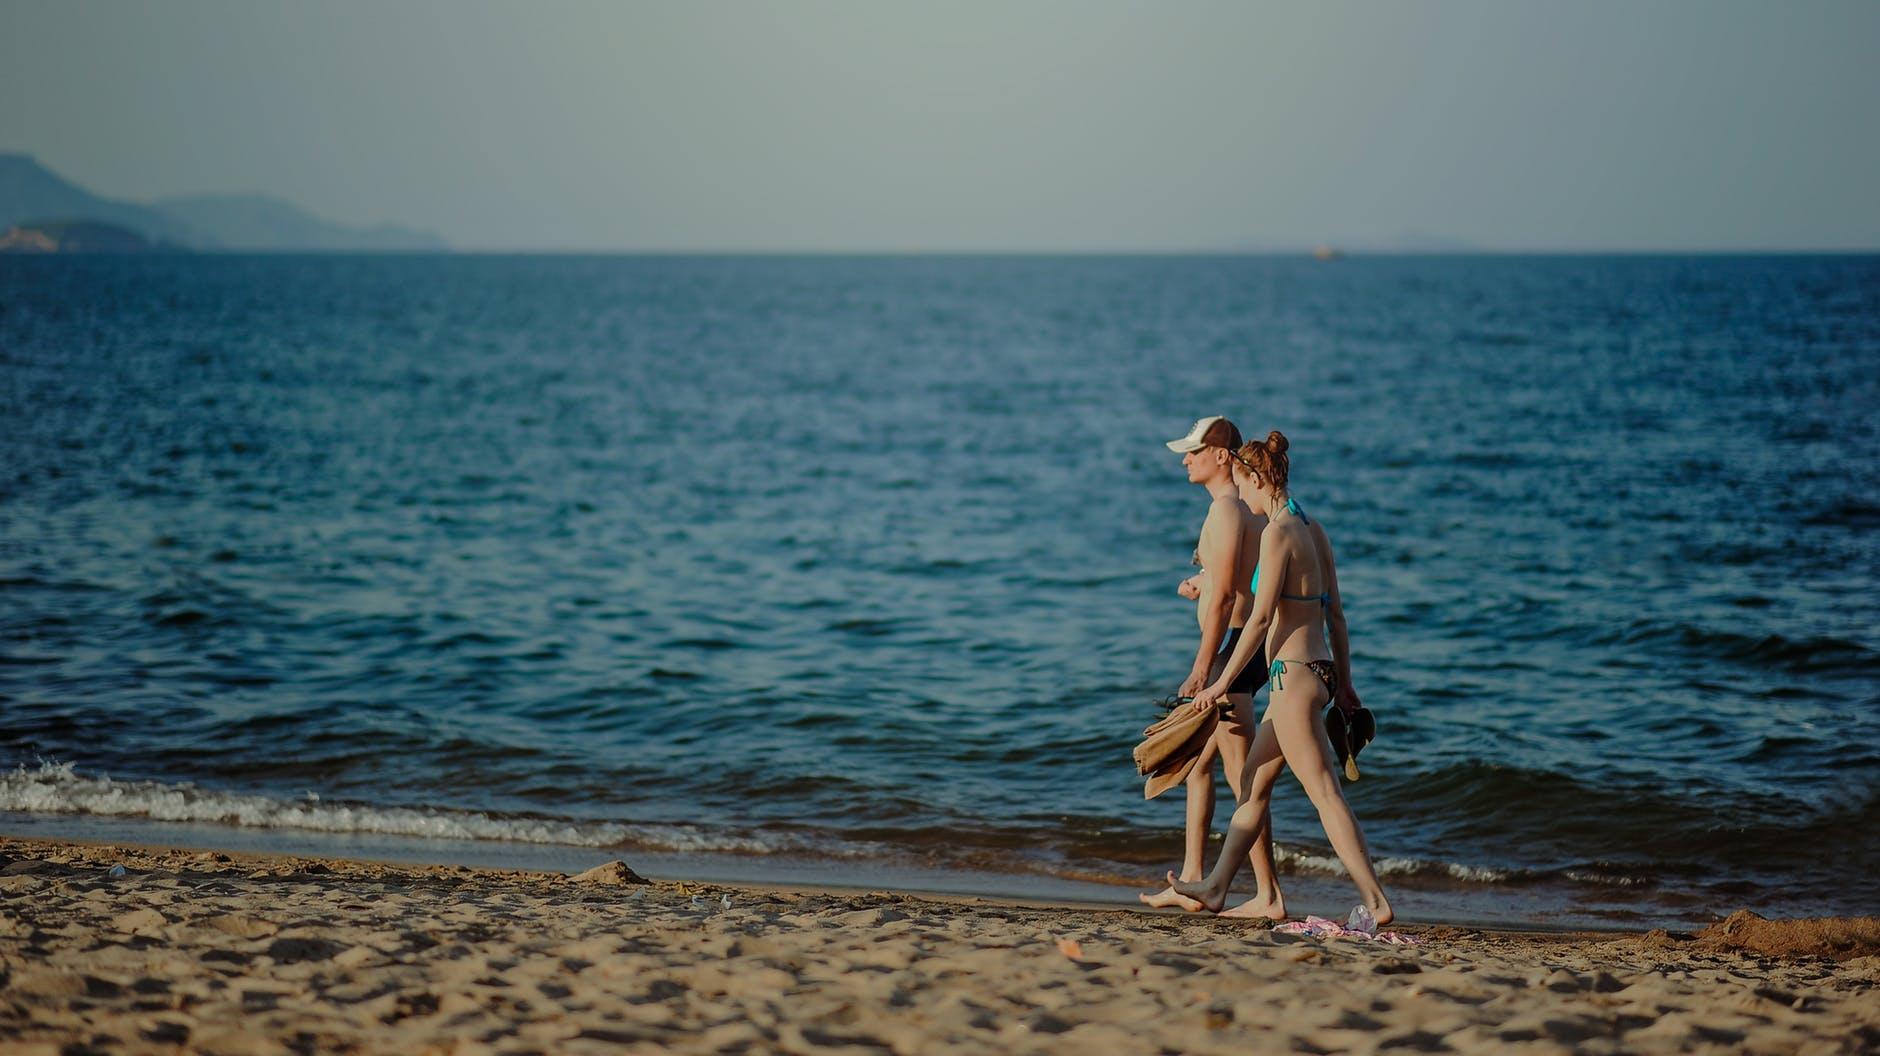 Photo of man and woman walking on seashore